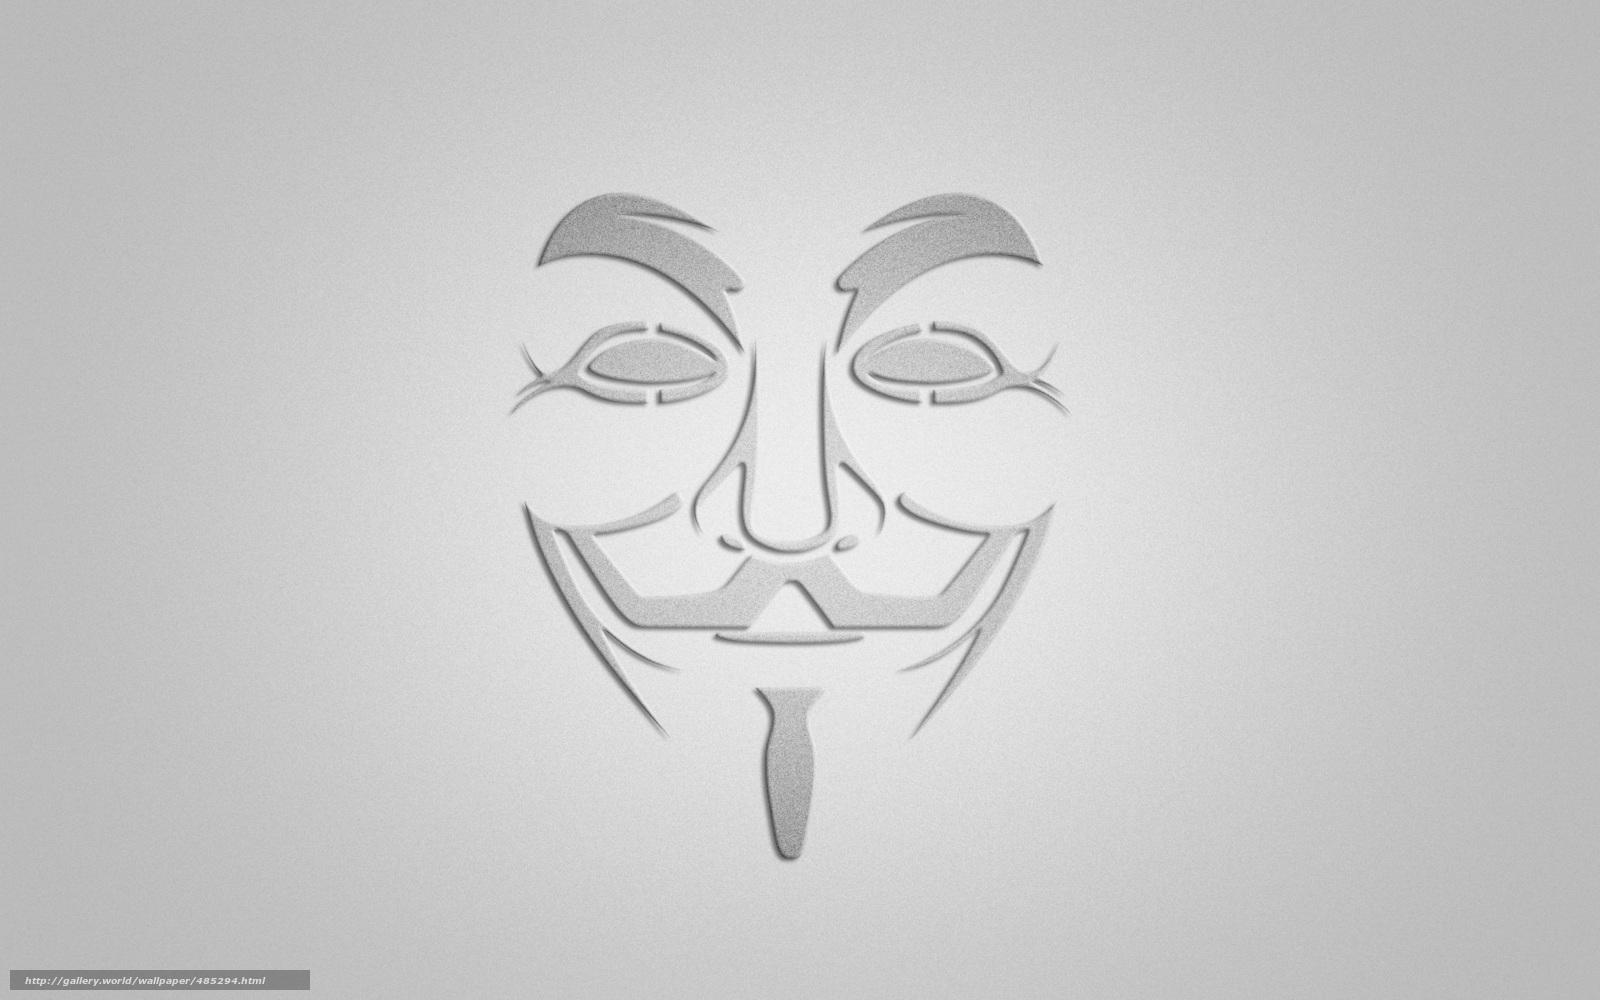 Descargar gratis v - Vendetta,  V de Vendetta,  mscara,  sonrer Fondos de escritorio en la resolucin 1920x1200 — imagen №485294